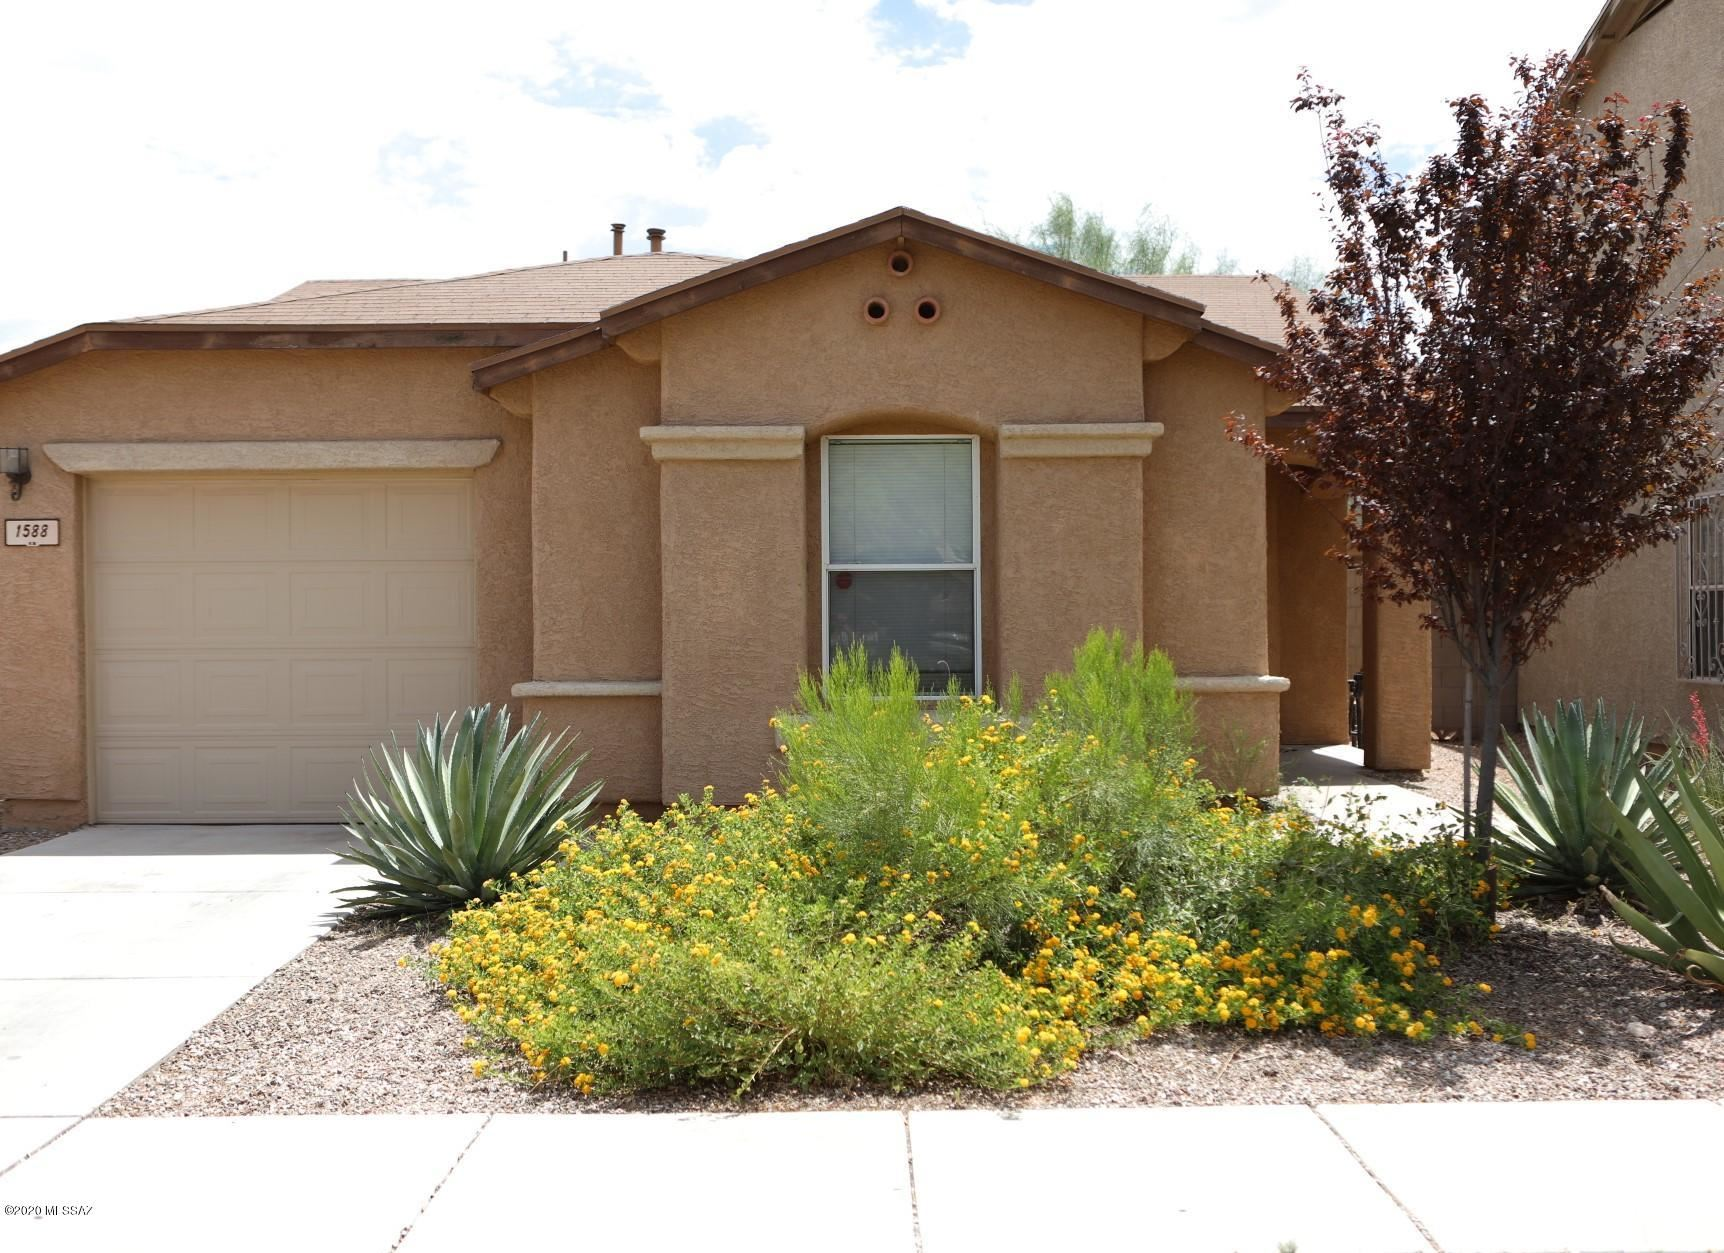 1588 E Balaton Place, Tucson, AZ 85706 - #: 22022020